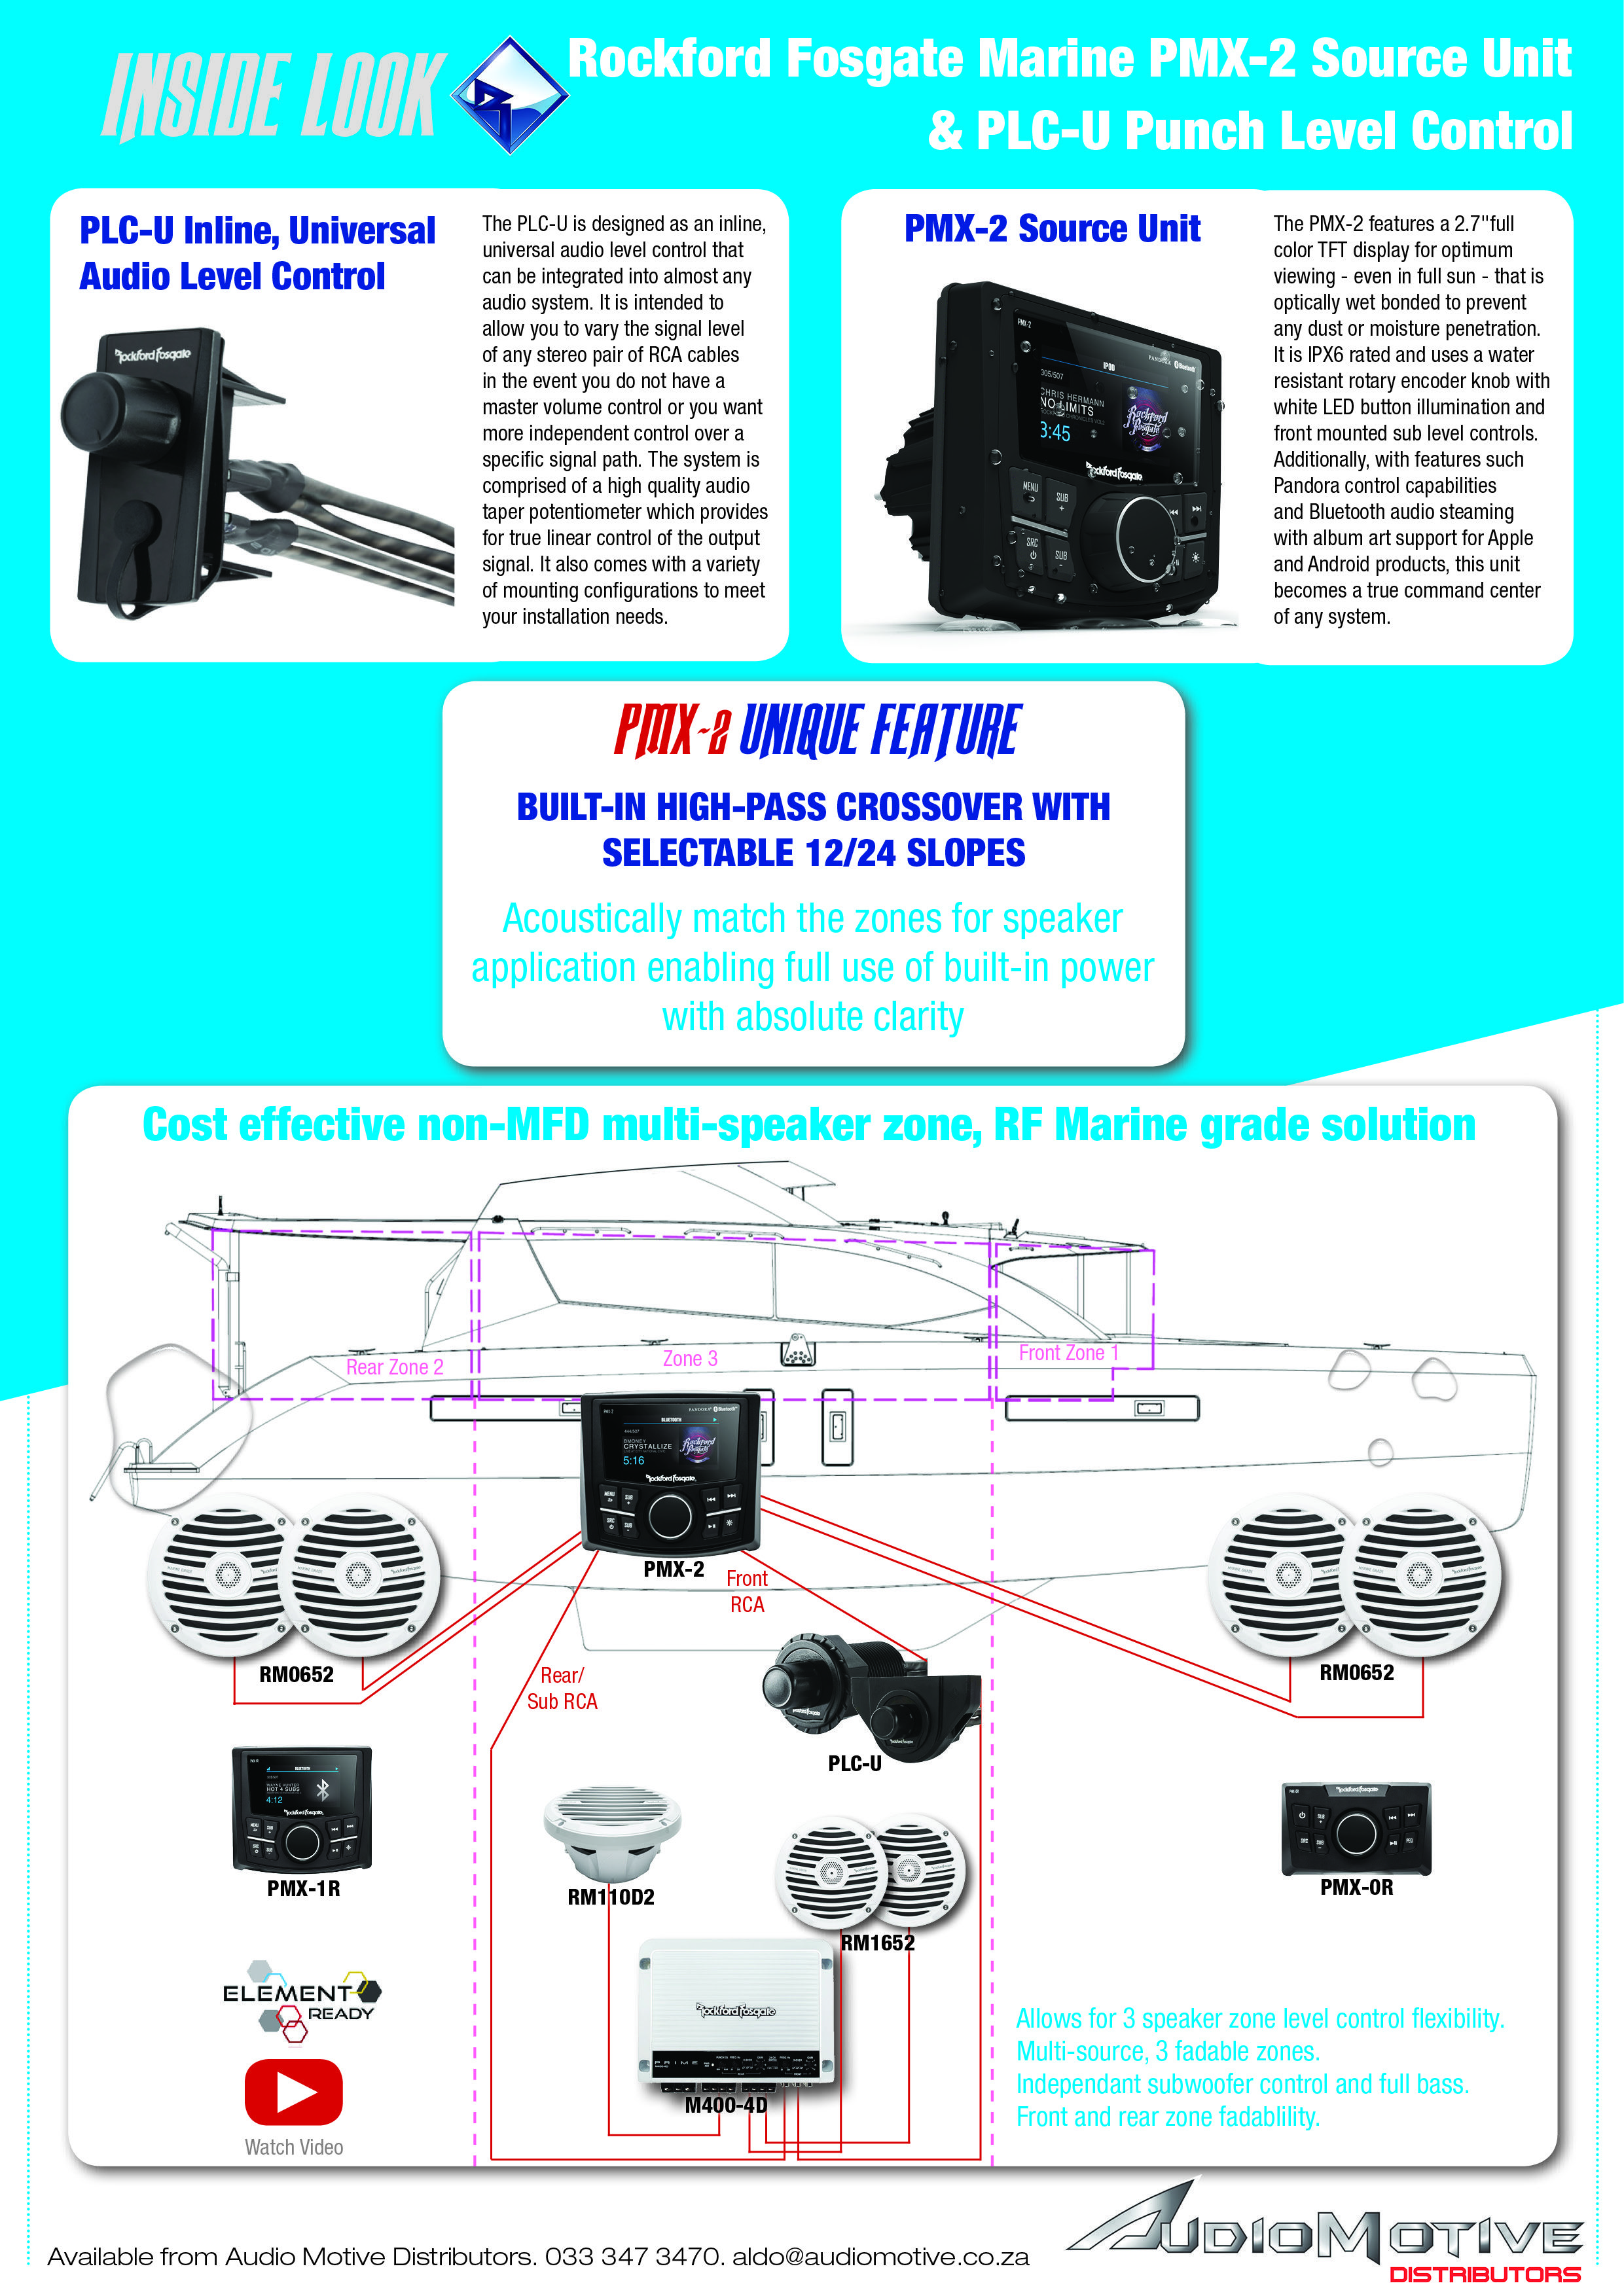 small resolution of  marineaudio boataudio boatsound sourceunit soundforboat rockford fosgate boat sound system setup pmx 2